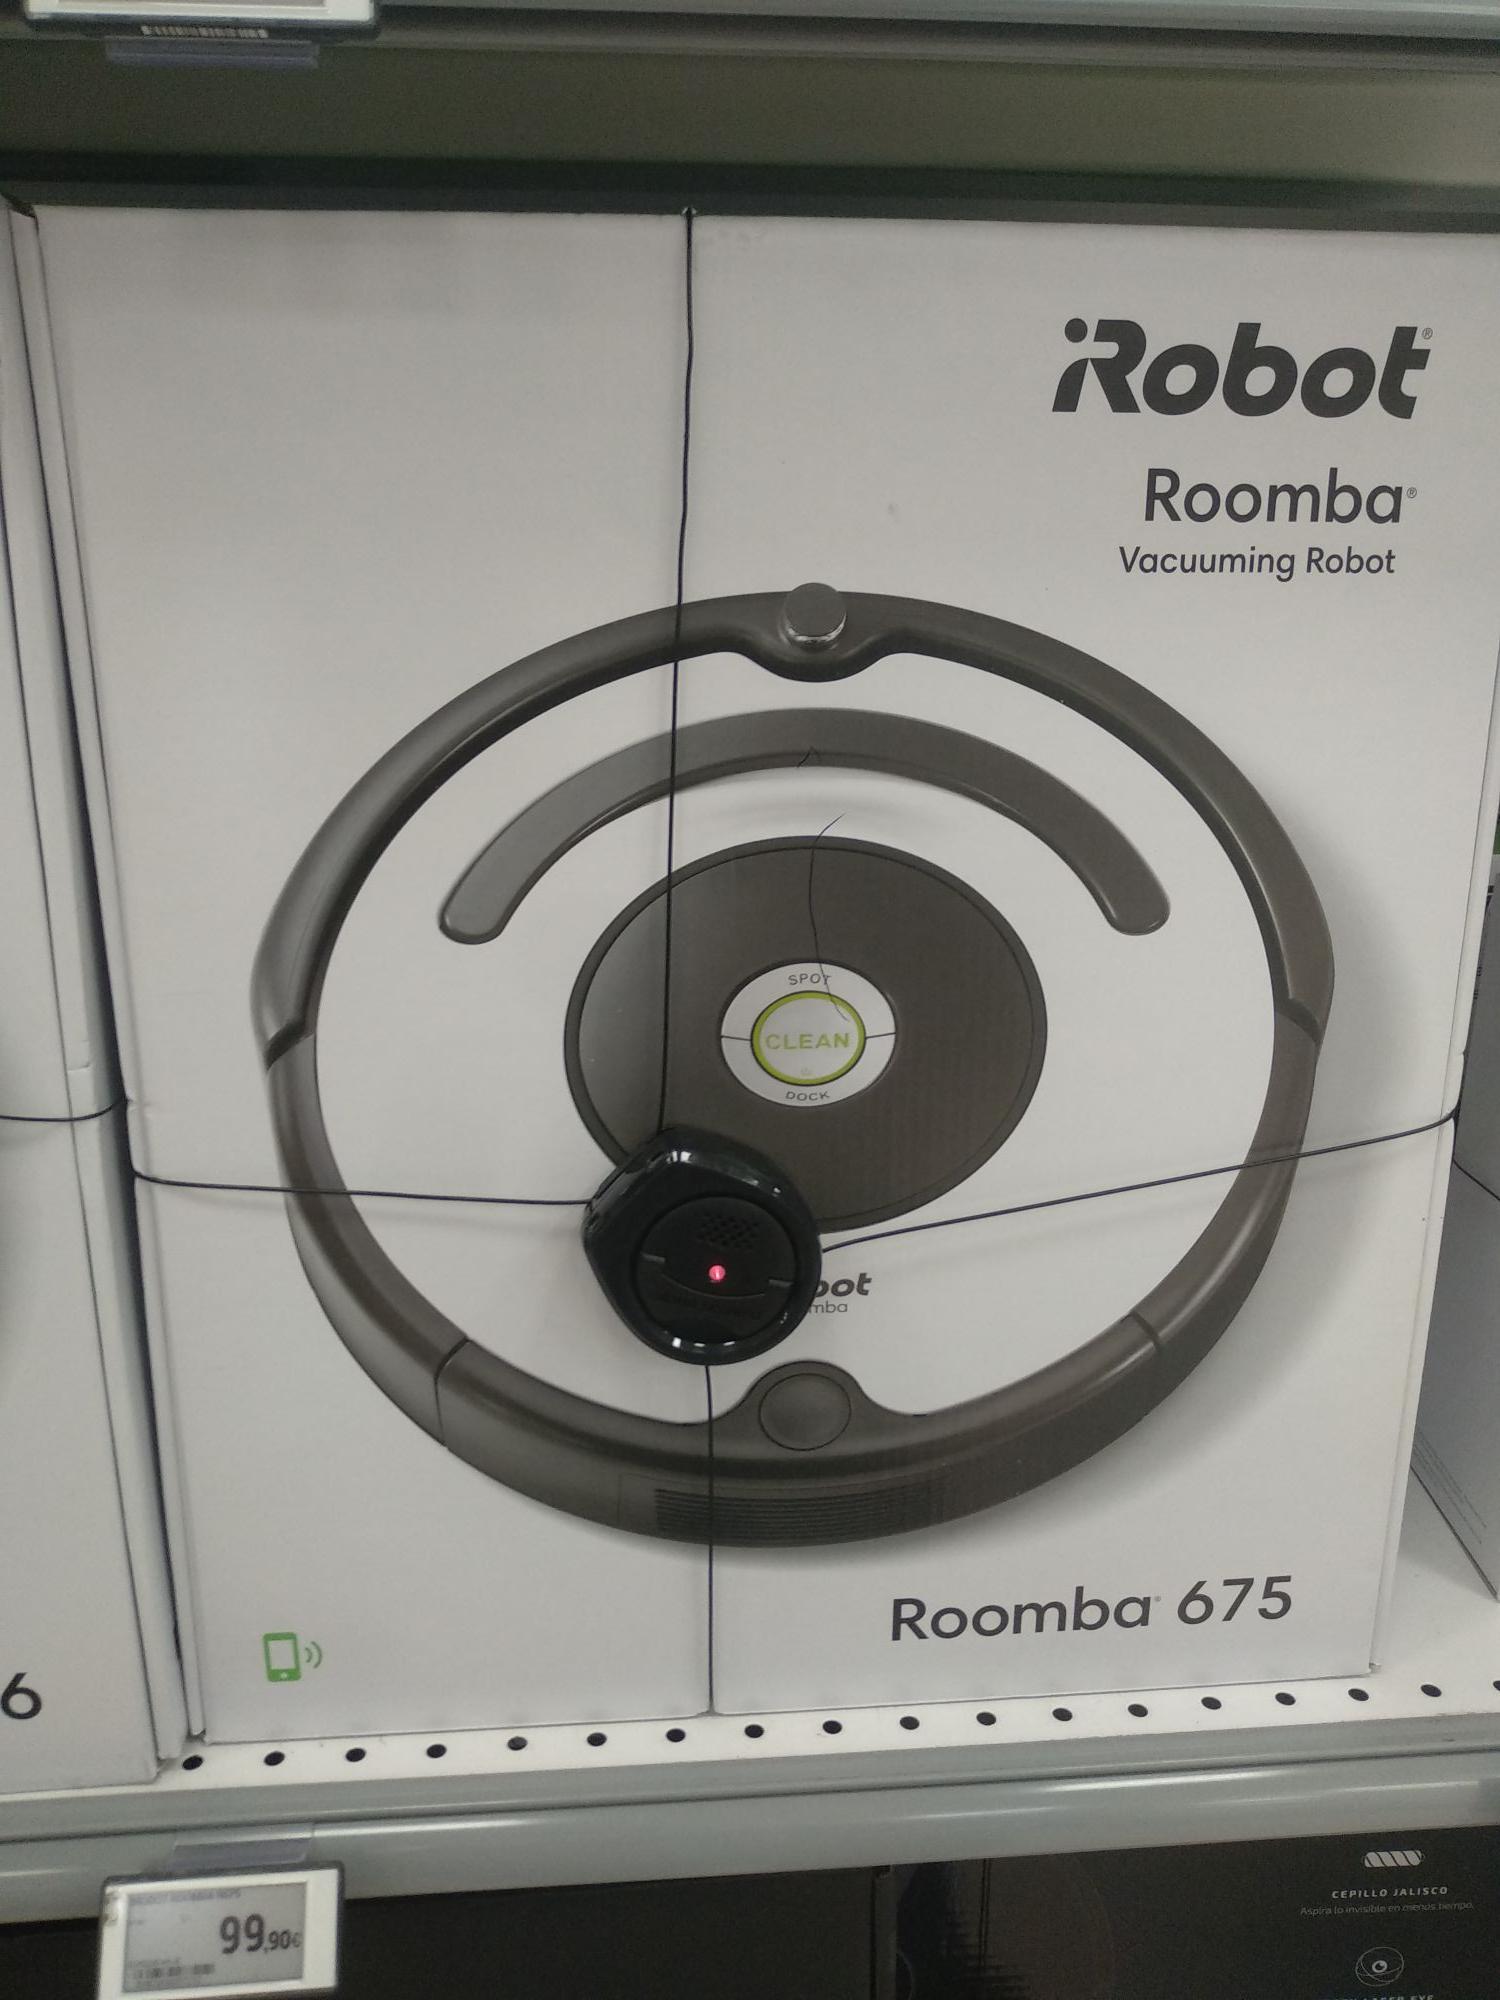 Roomba 675. Carrefour Son Cotoner